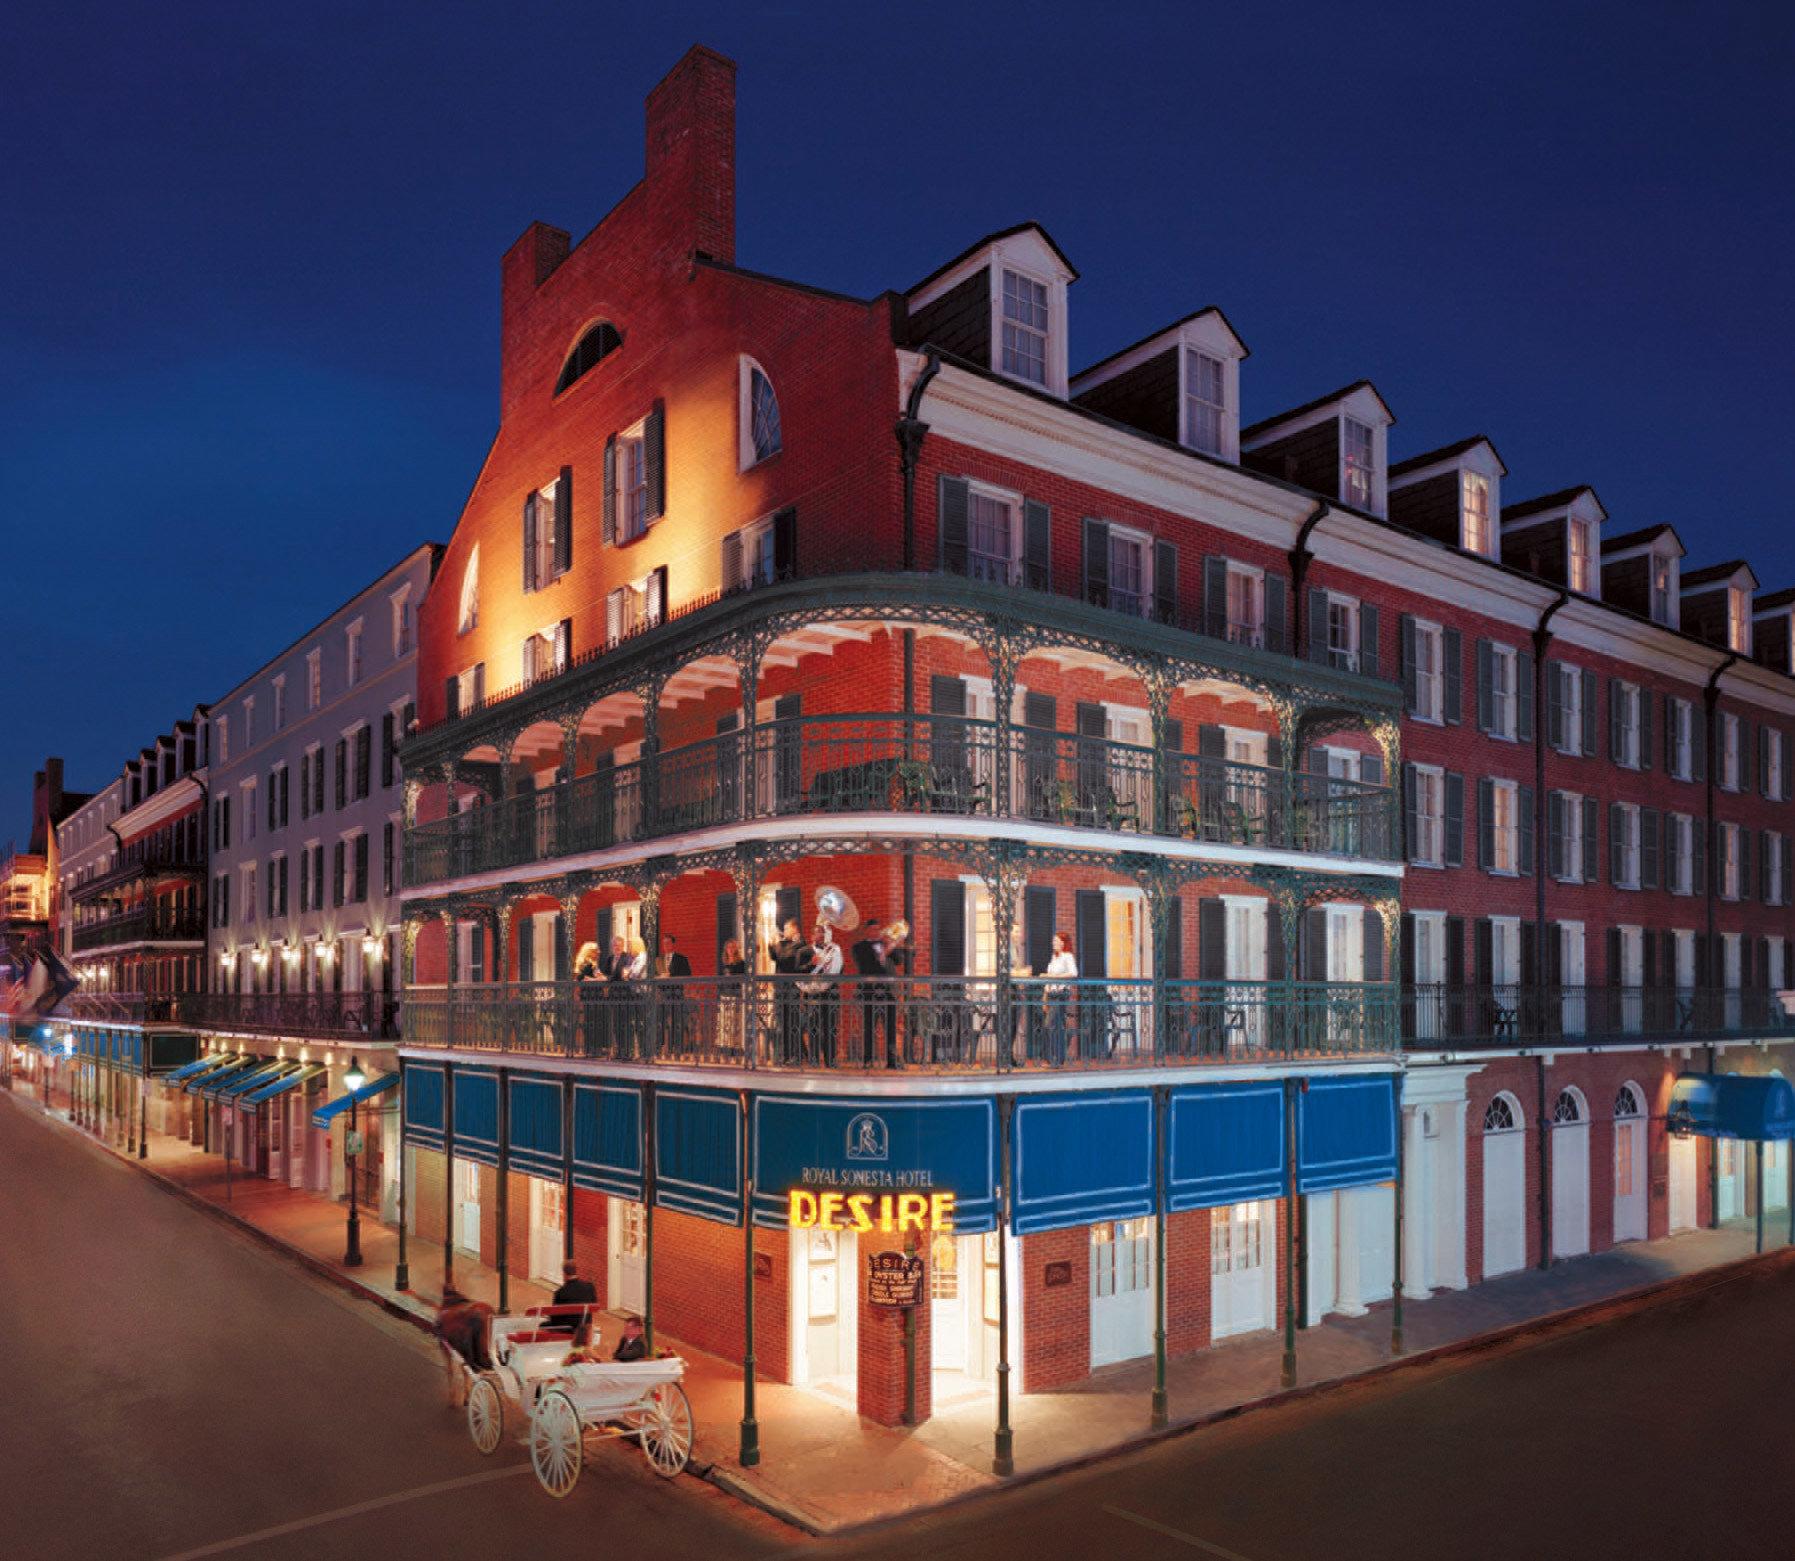 Hotels Trip Ideas landmark building Architecture night evening Downtown plaza